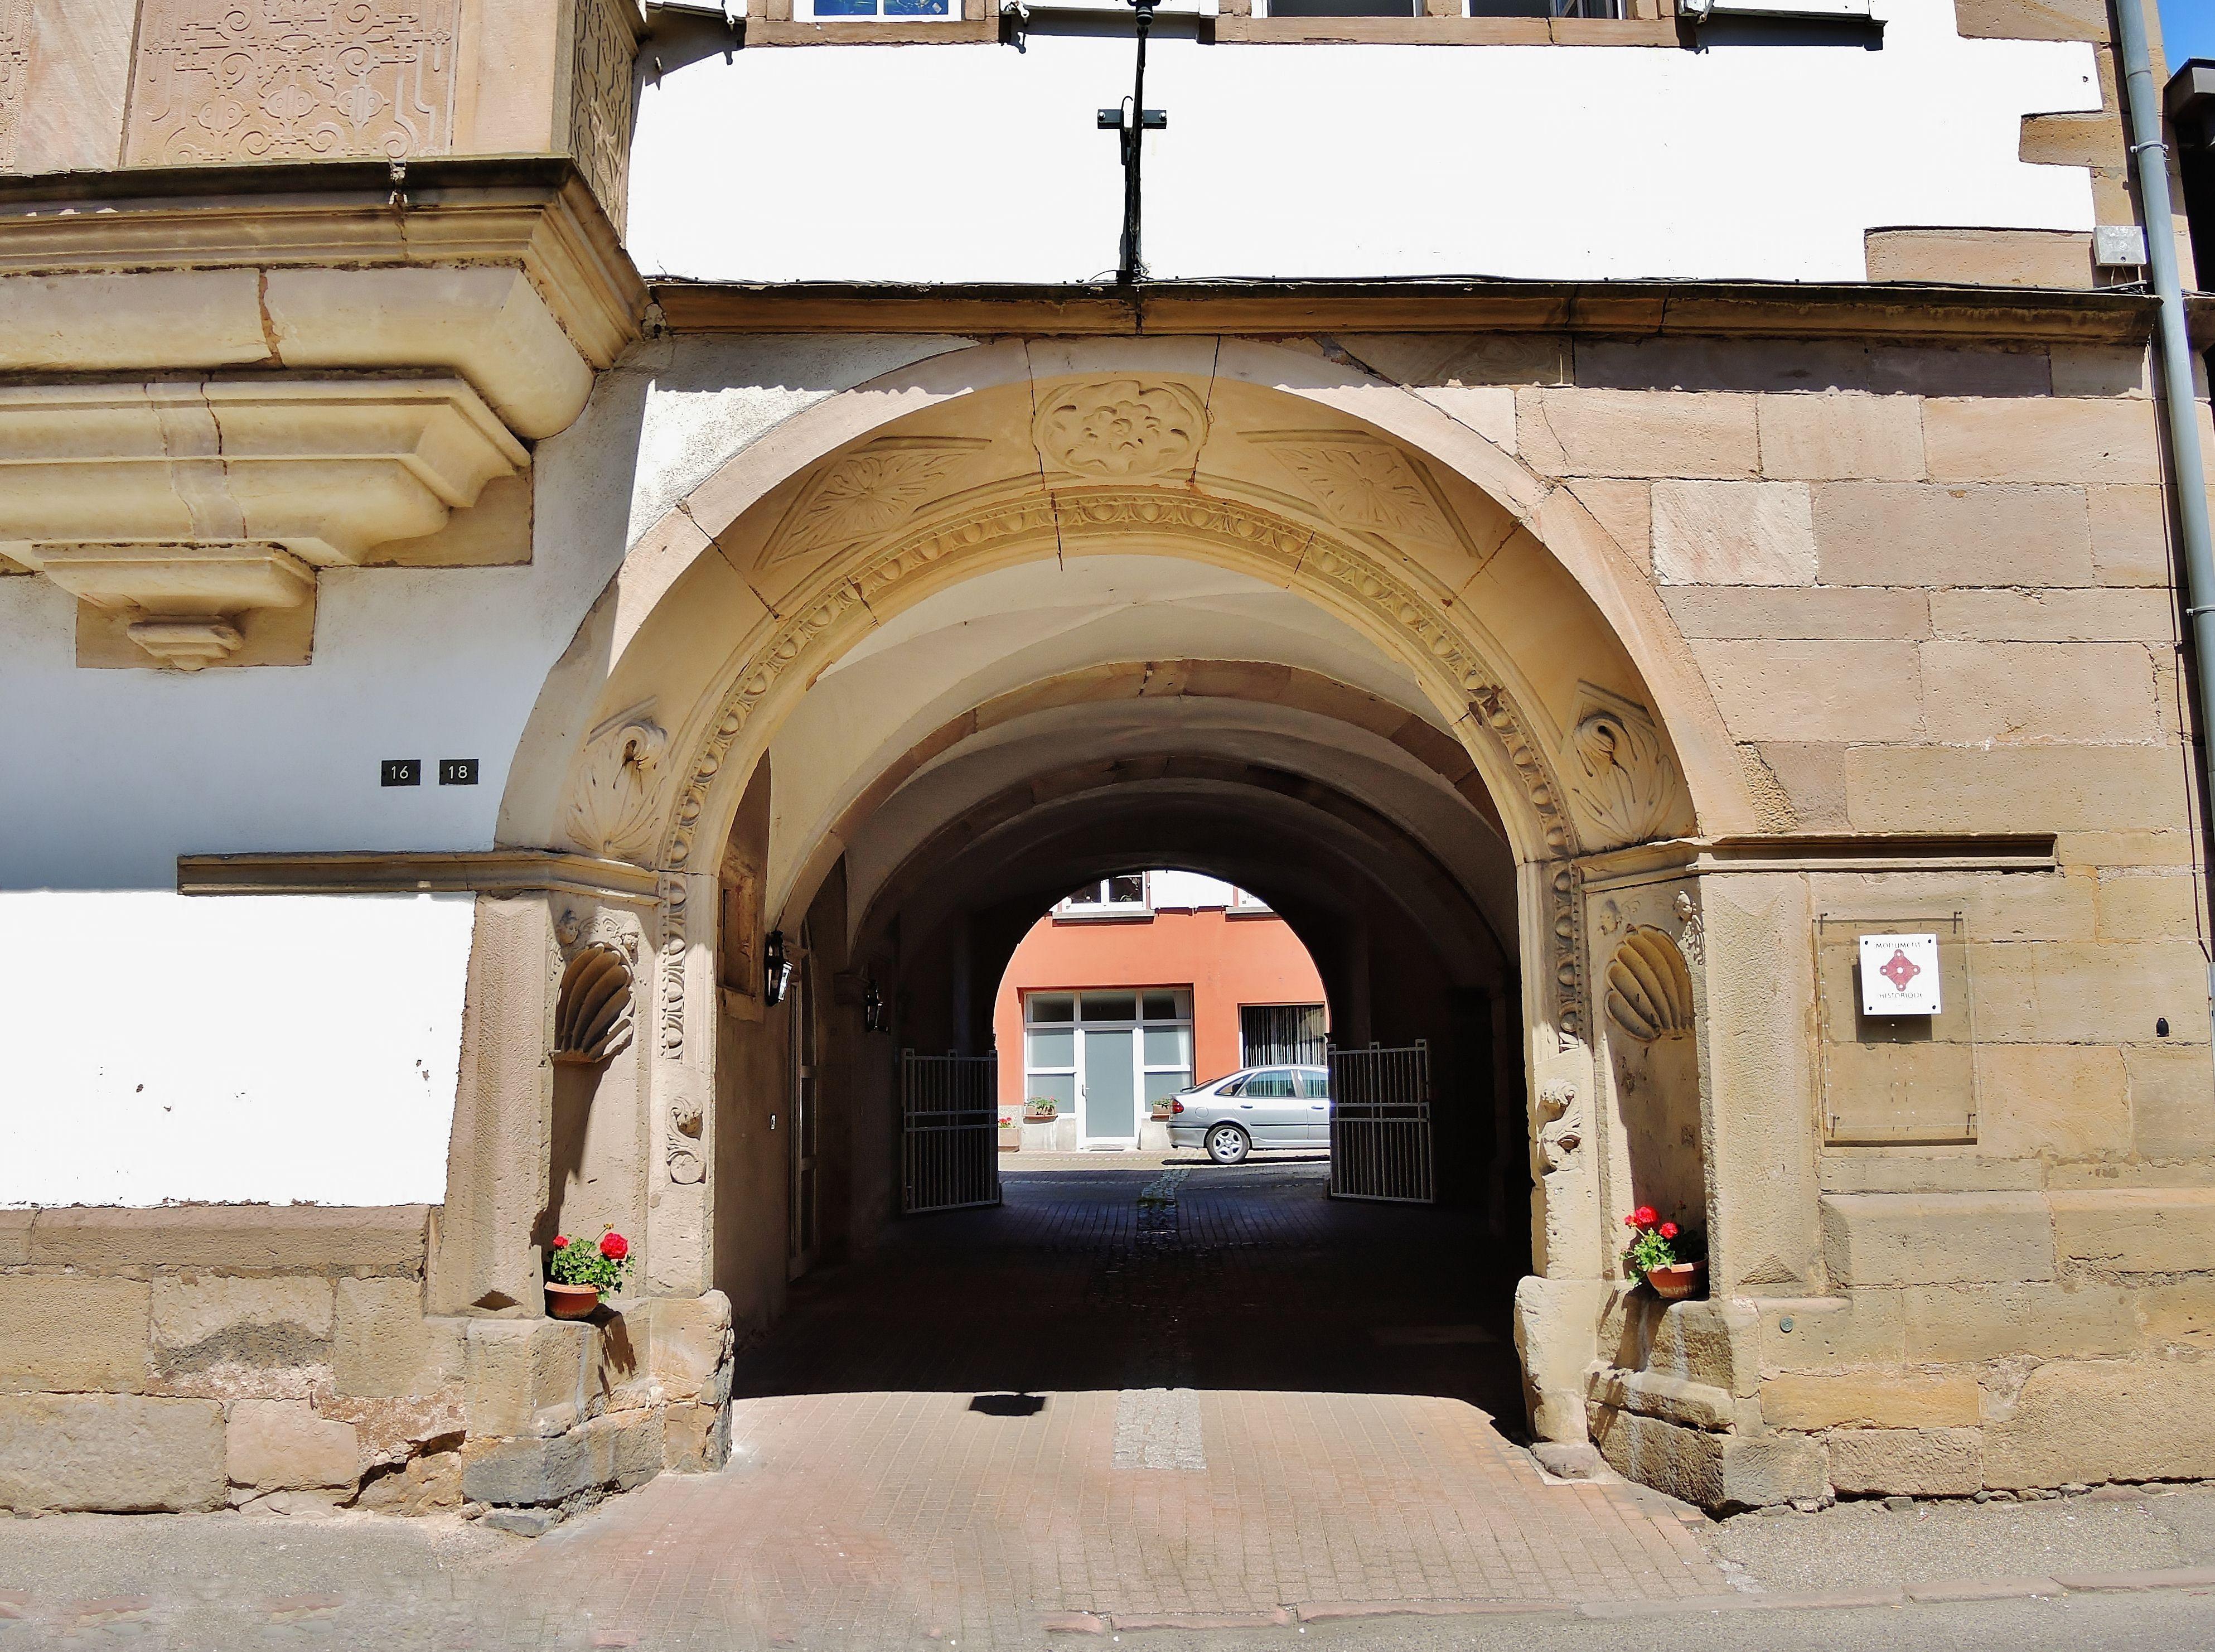 Le Porche De La Maison file:porche de la maison canoniale de 1628 - wikimedia commons